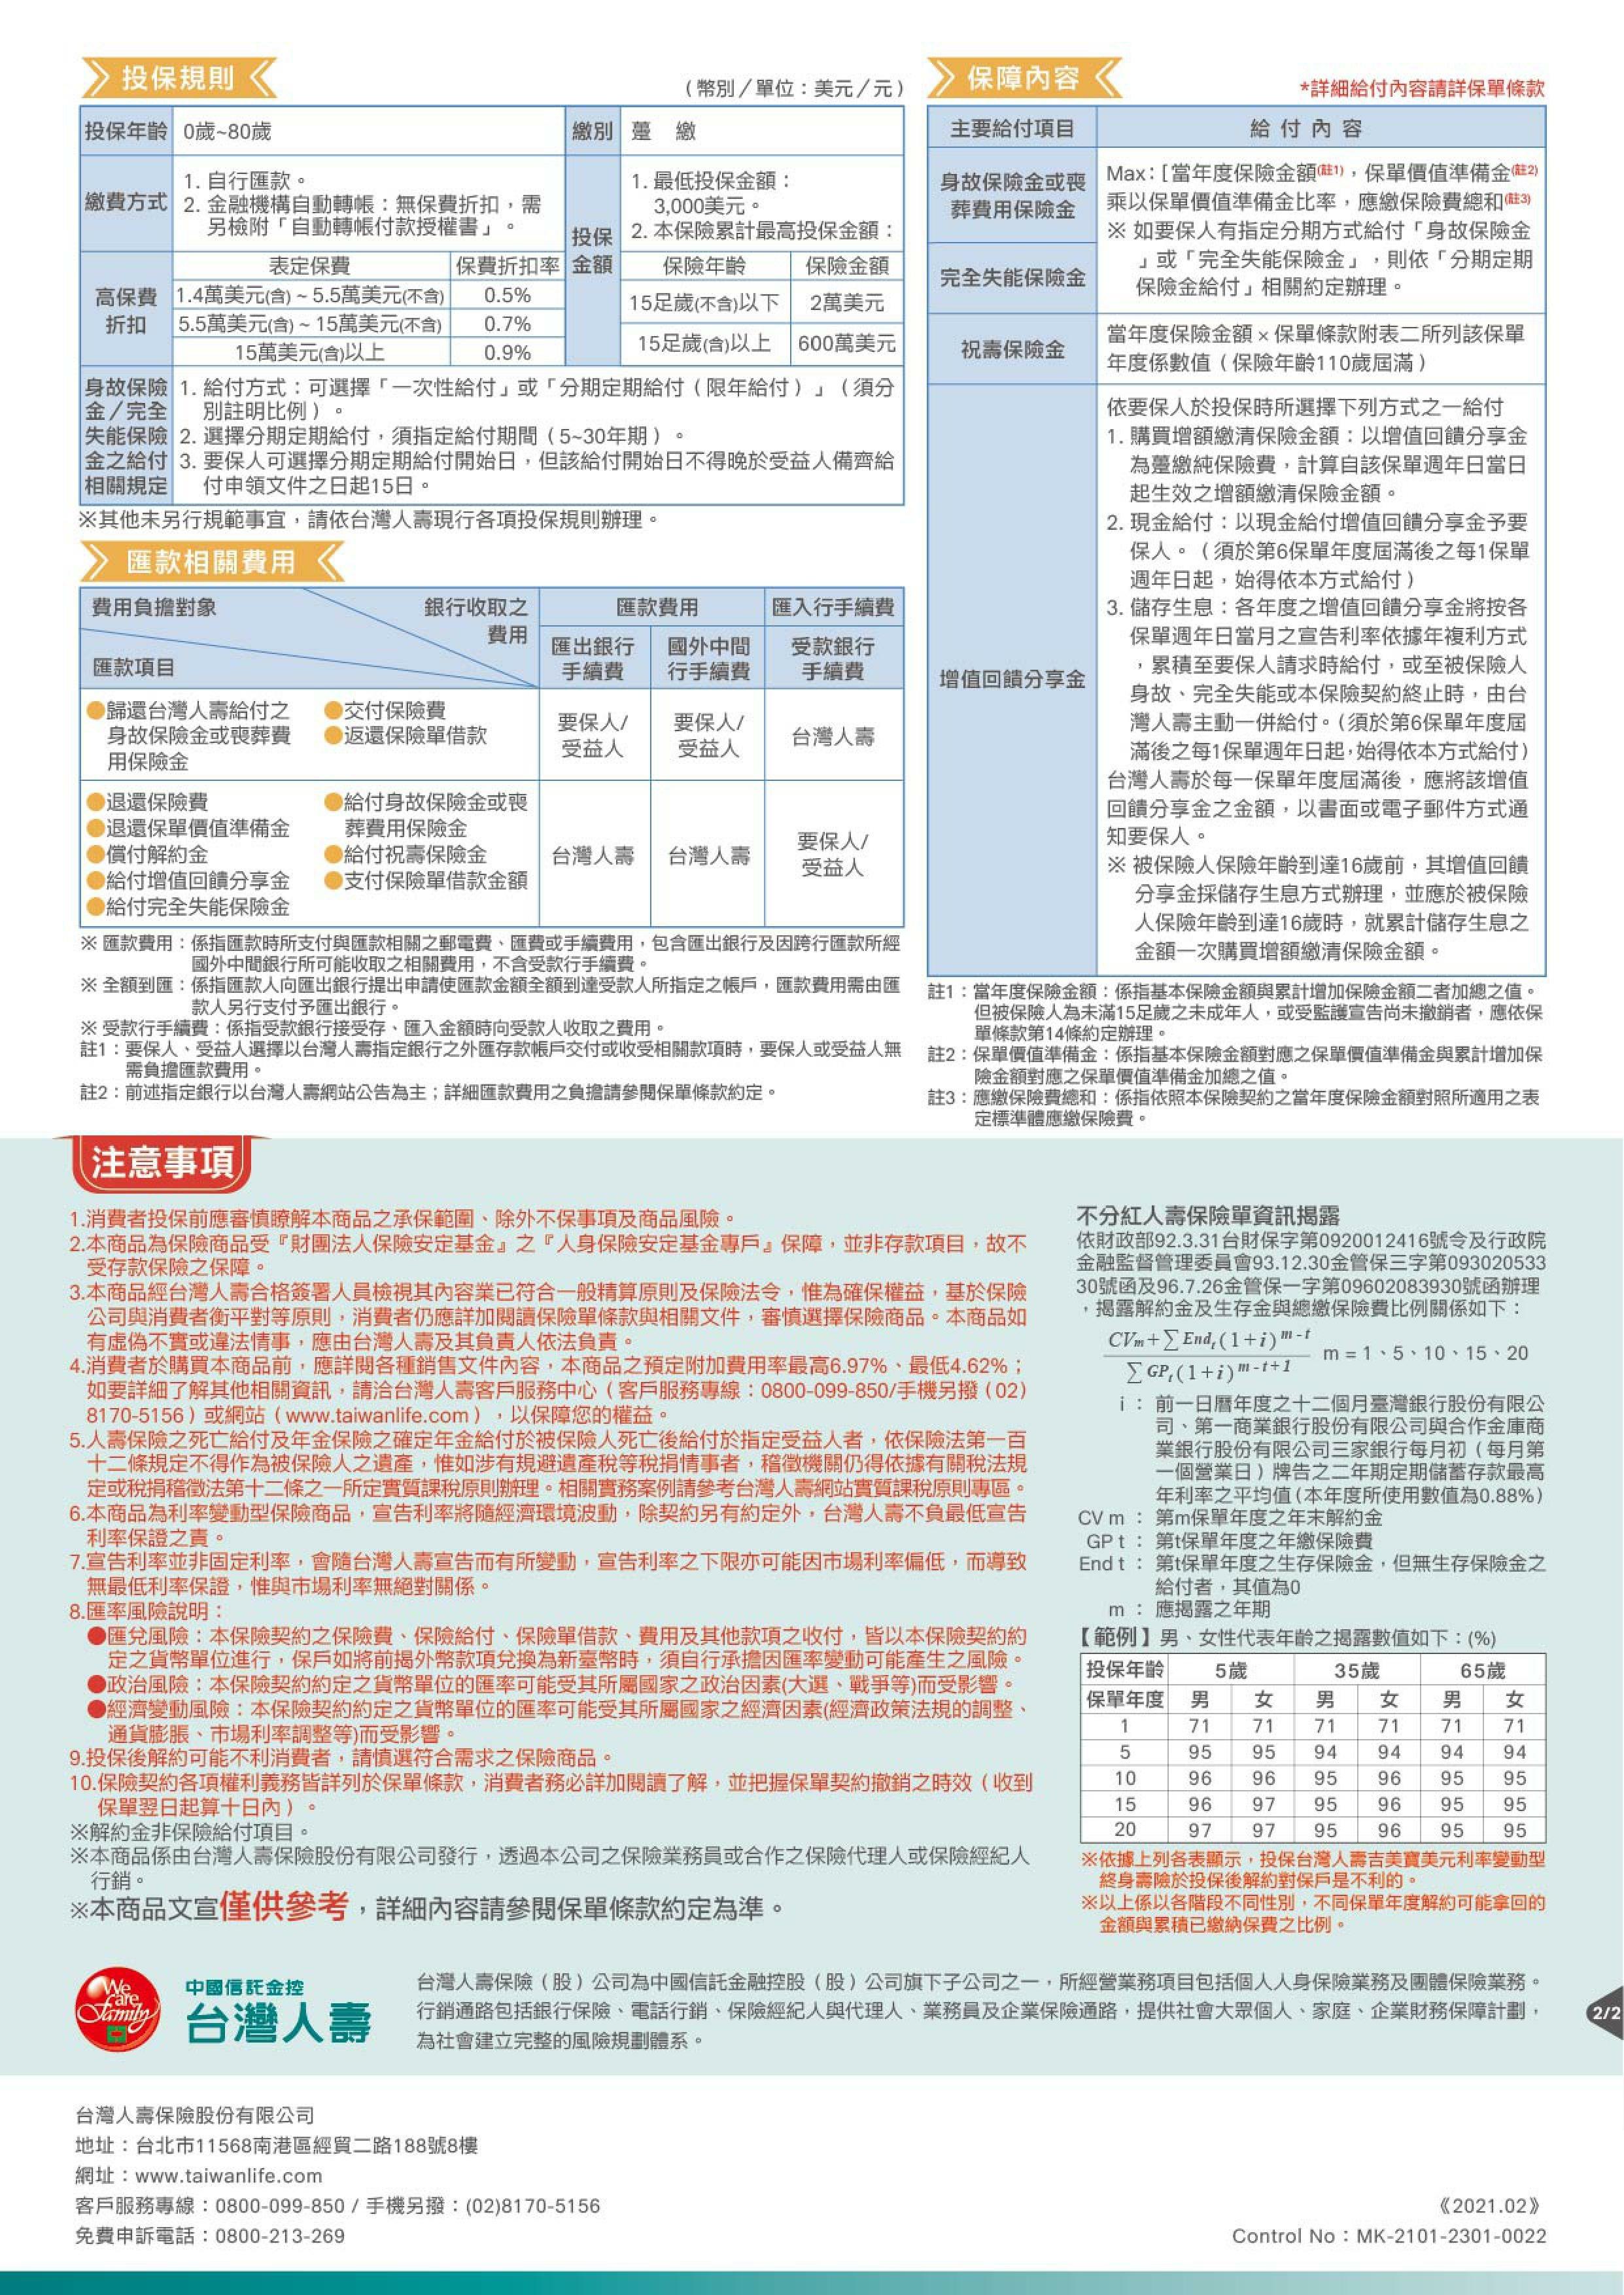 0002 - 2021-02-03T211317.142.jpg